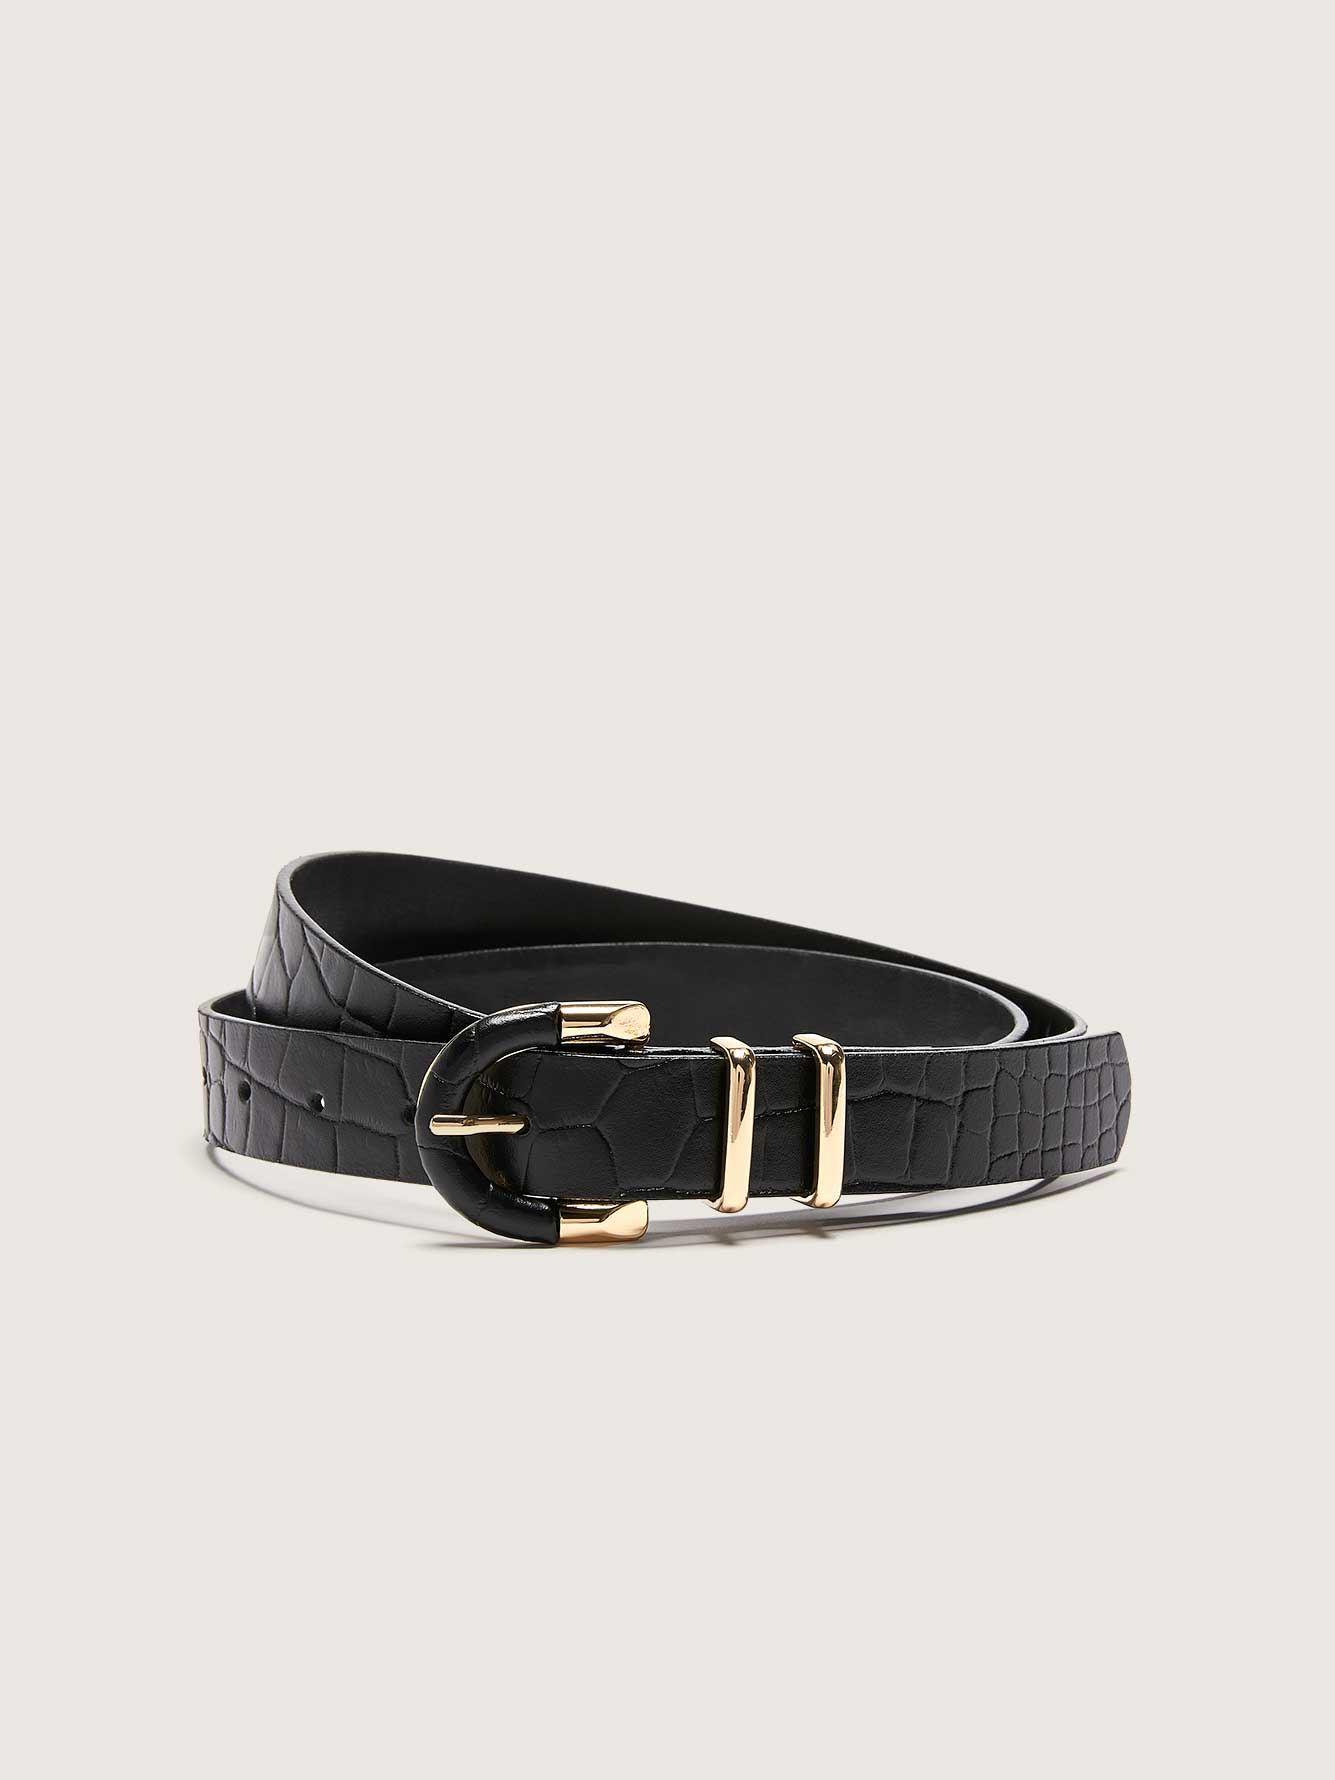 Crocodile Leather Belt with Metallic Buckle - Addition Elle